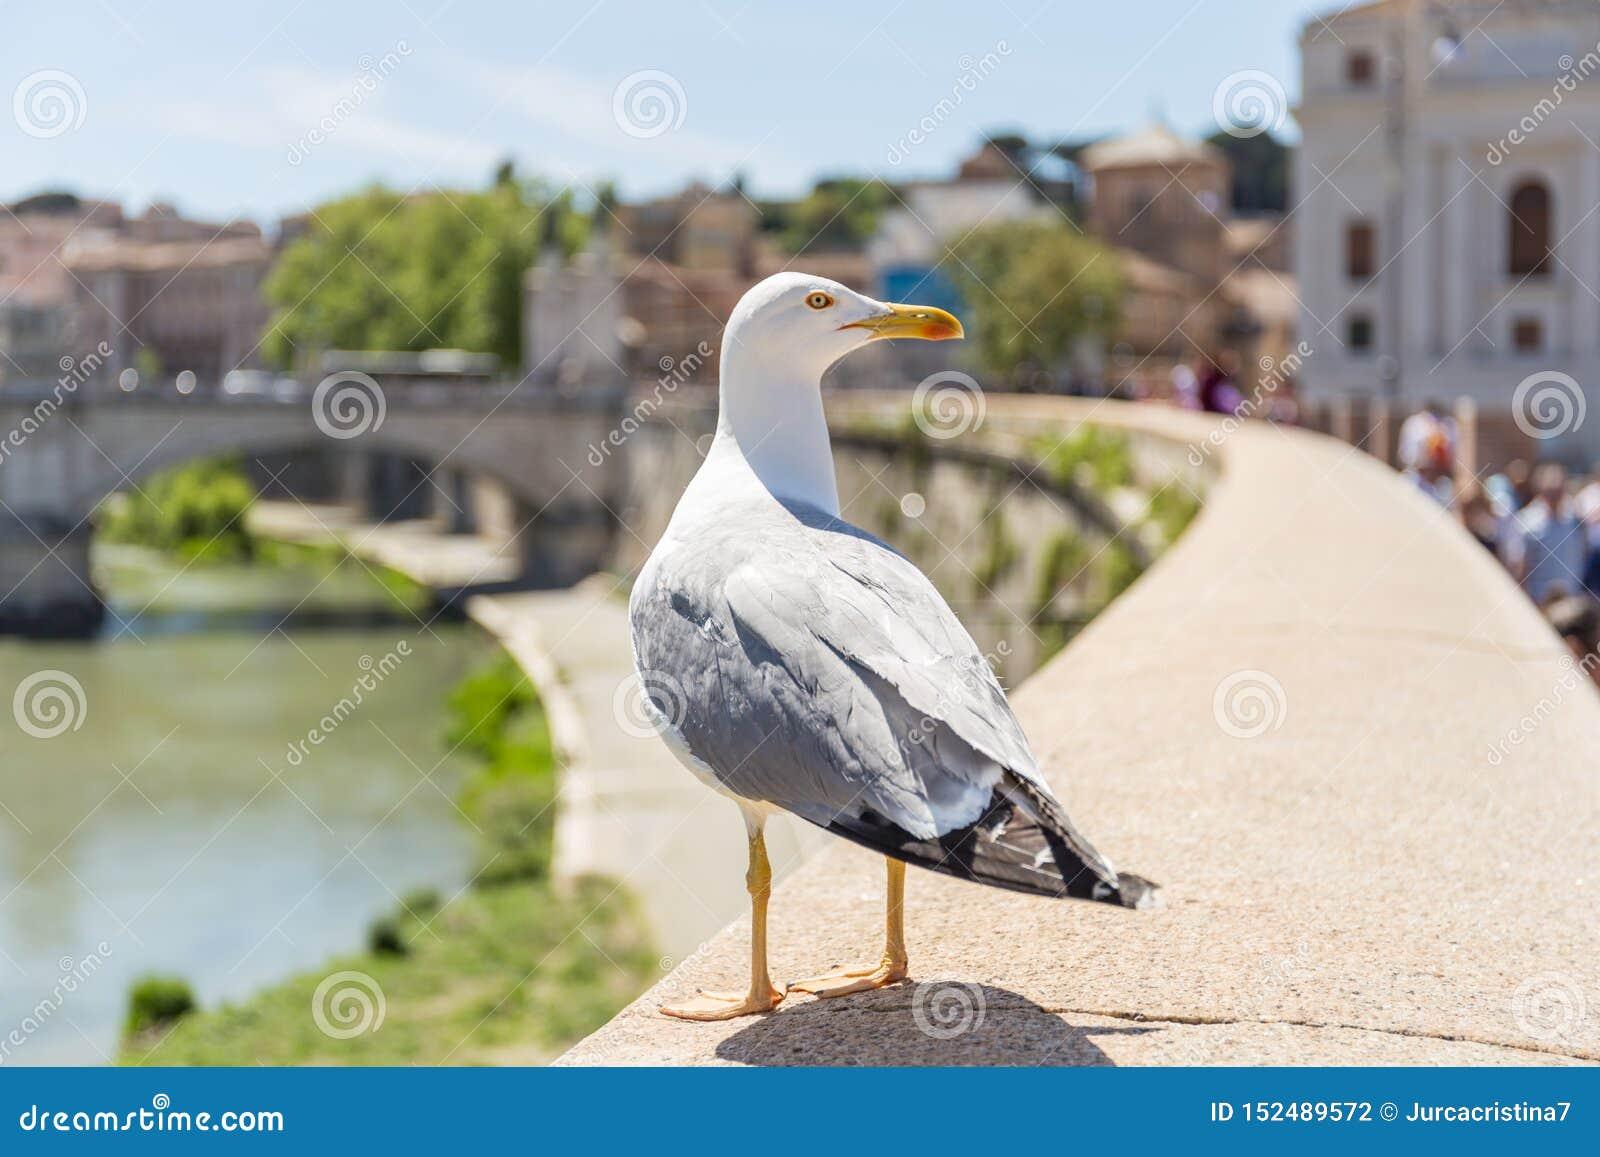 Seagull som söker efter mat på den Tiber flodväggen, Vittorio Emanuele II bro i bakgrunden italy rome